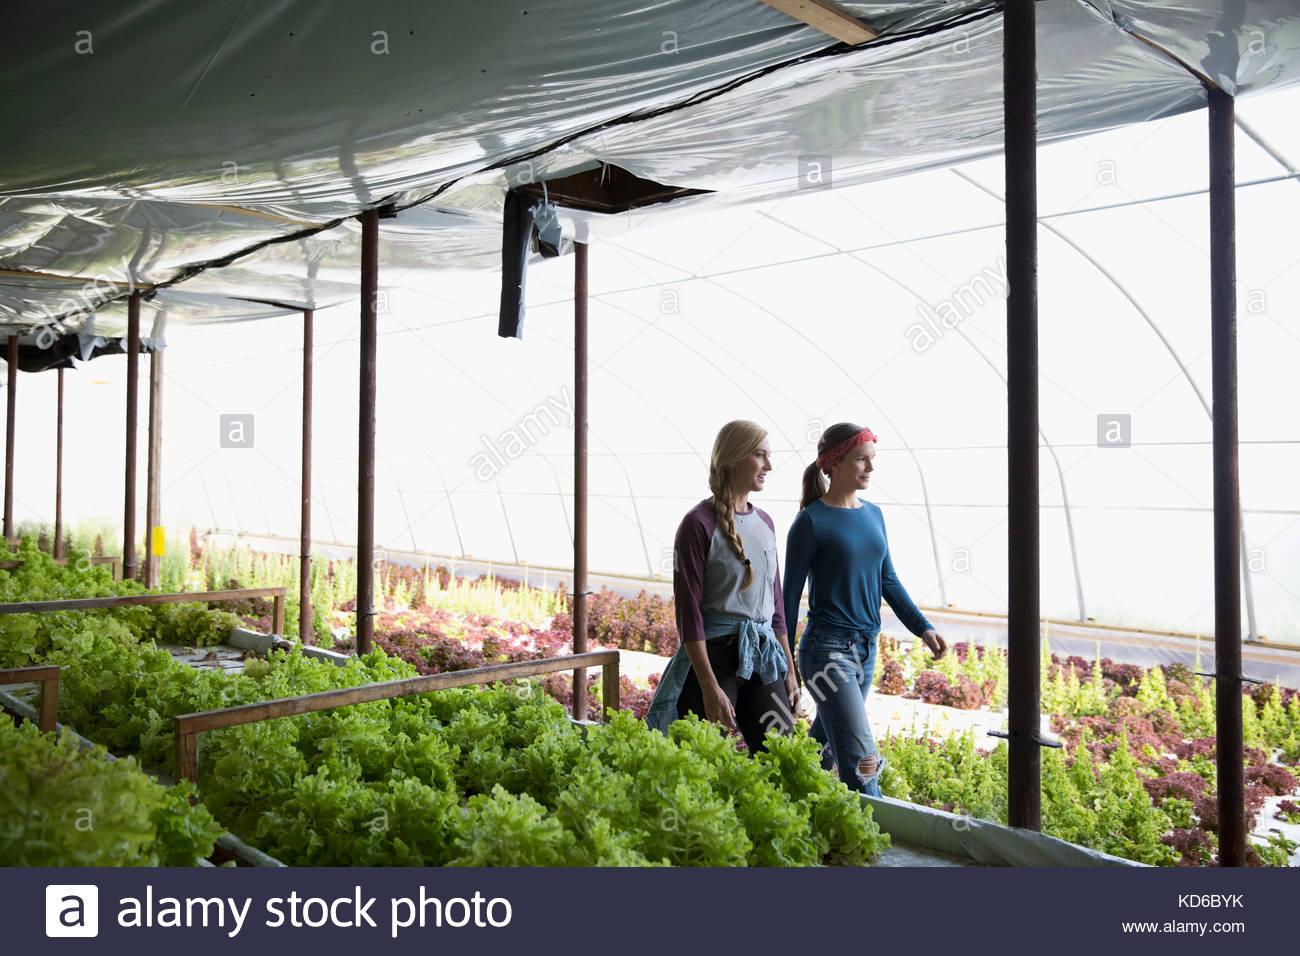 Female farmers walking in greenhouse - Stock Image